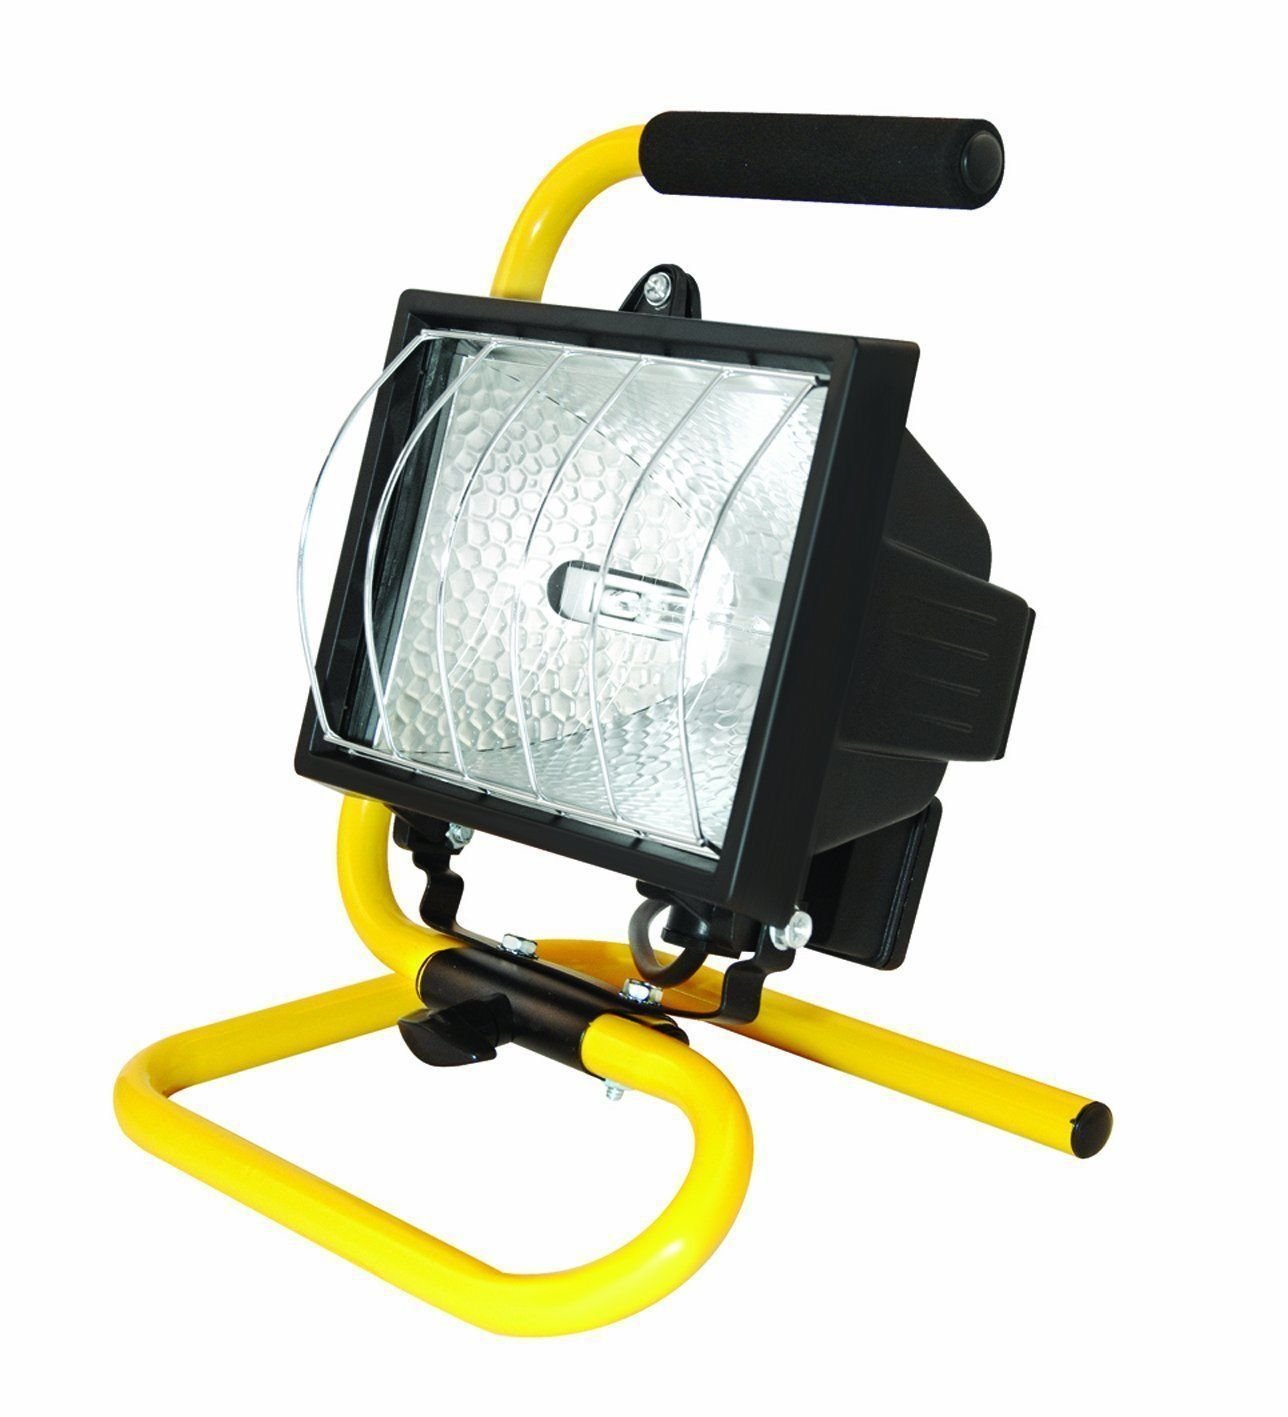 Unibos Portable 500W Halogen Work Light Floodlight Spot Lamp Garden Indoor Outdoor Powerful Light